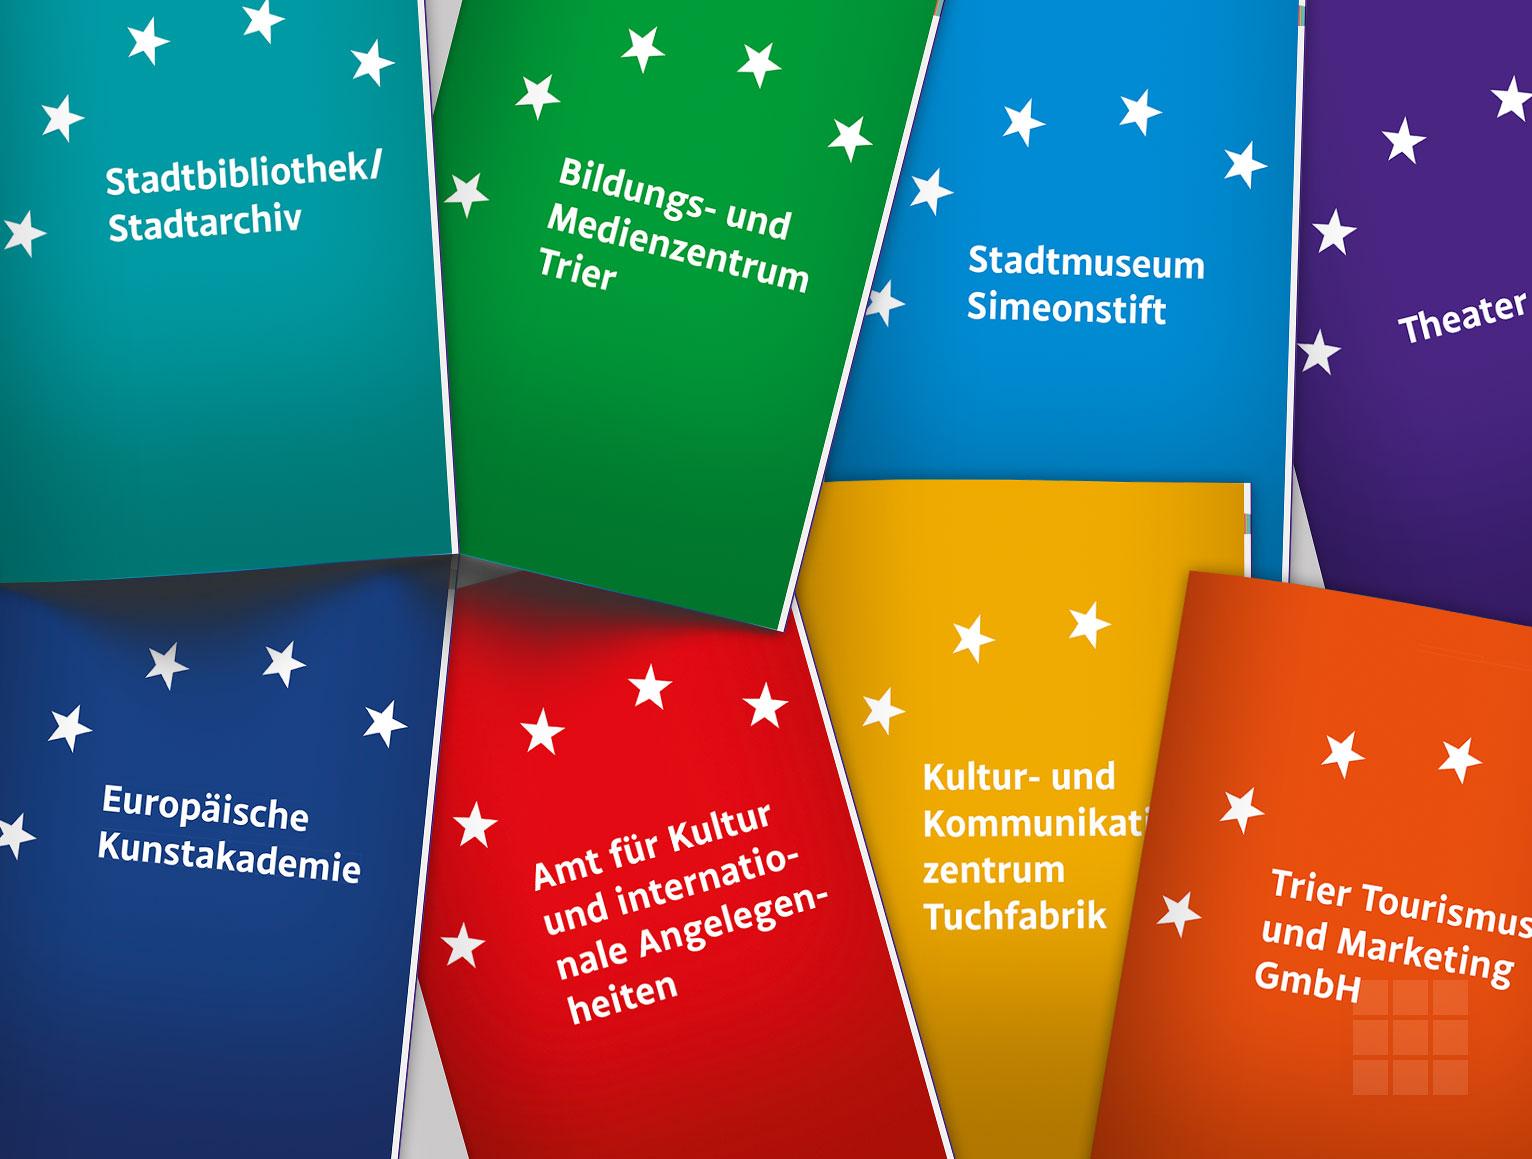 Kapitelintros mit Logo-Adaptation - Kulturbericht Stadt Trier